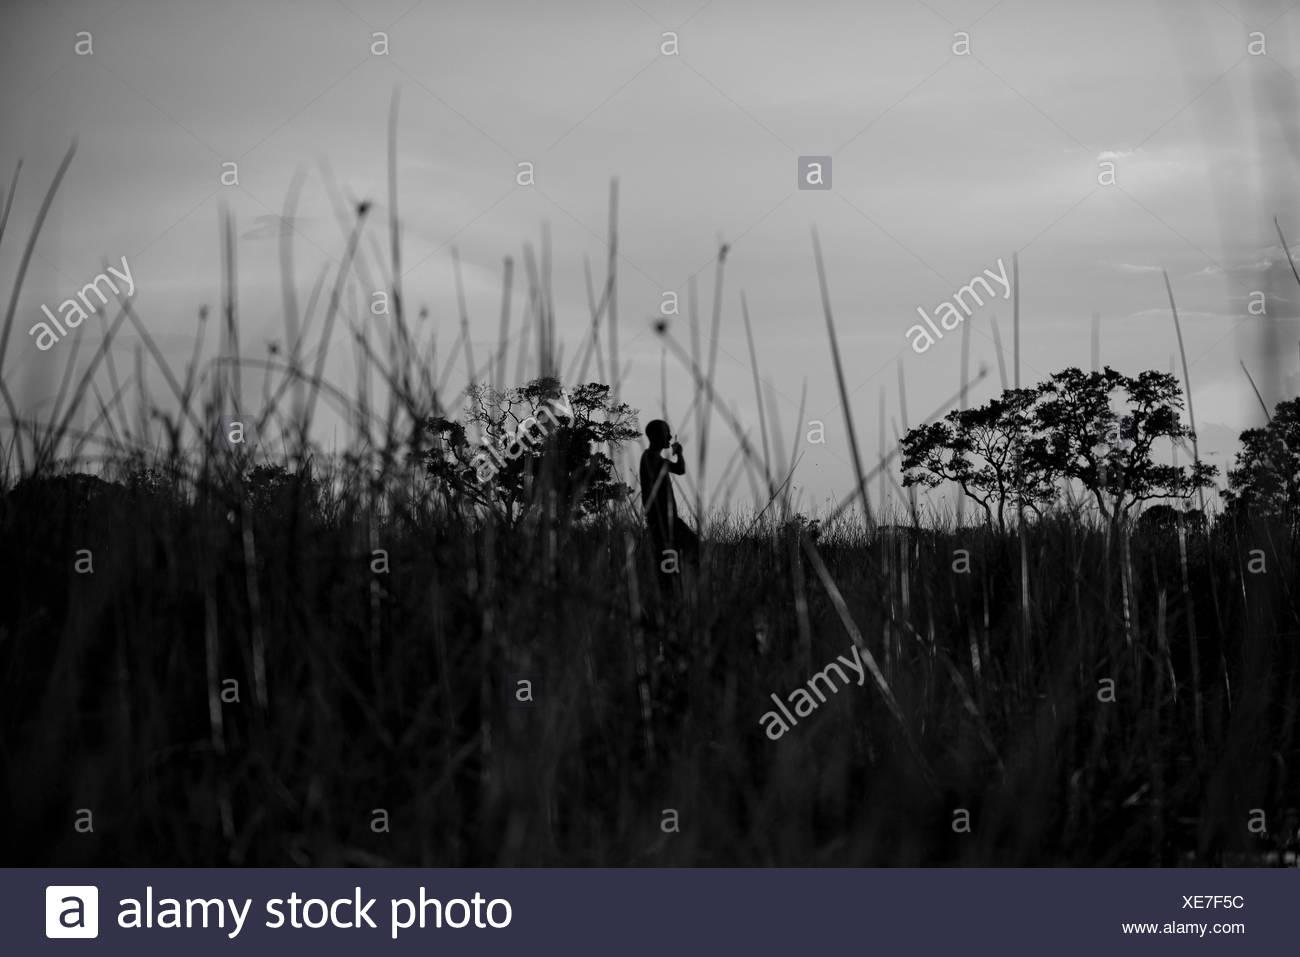 A man enjoys the sundown and the rest in the Okavango delta, Botswana - Stock Image